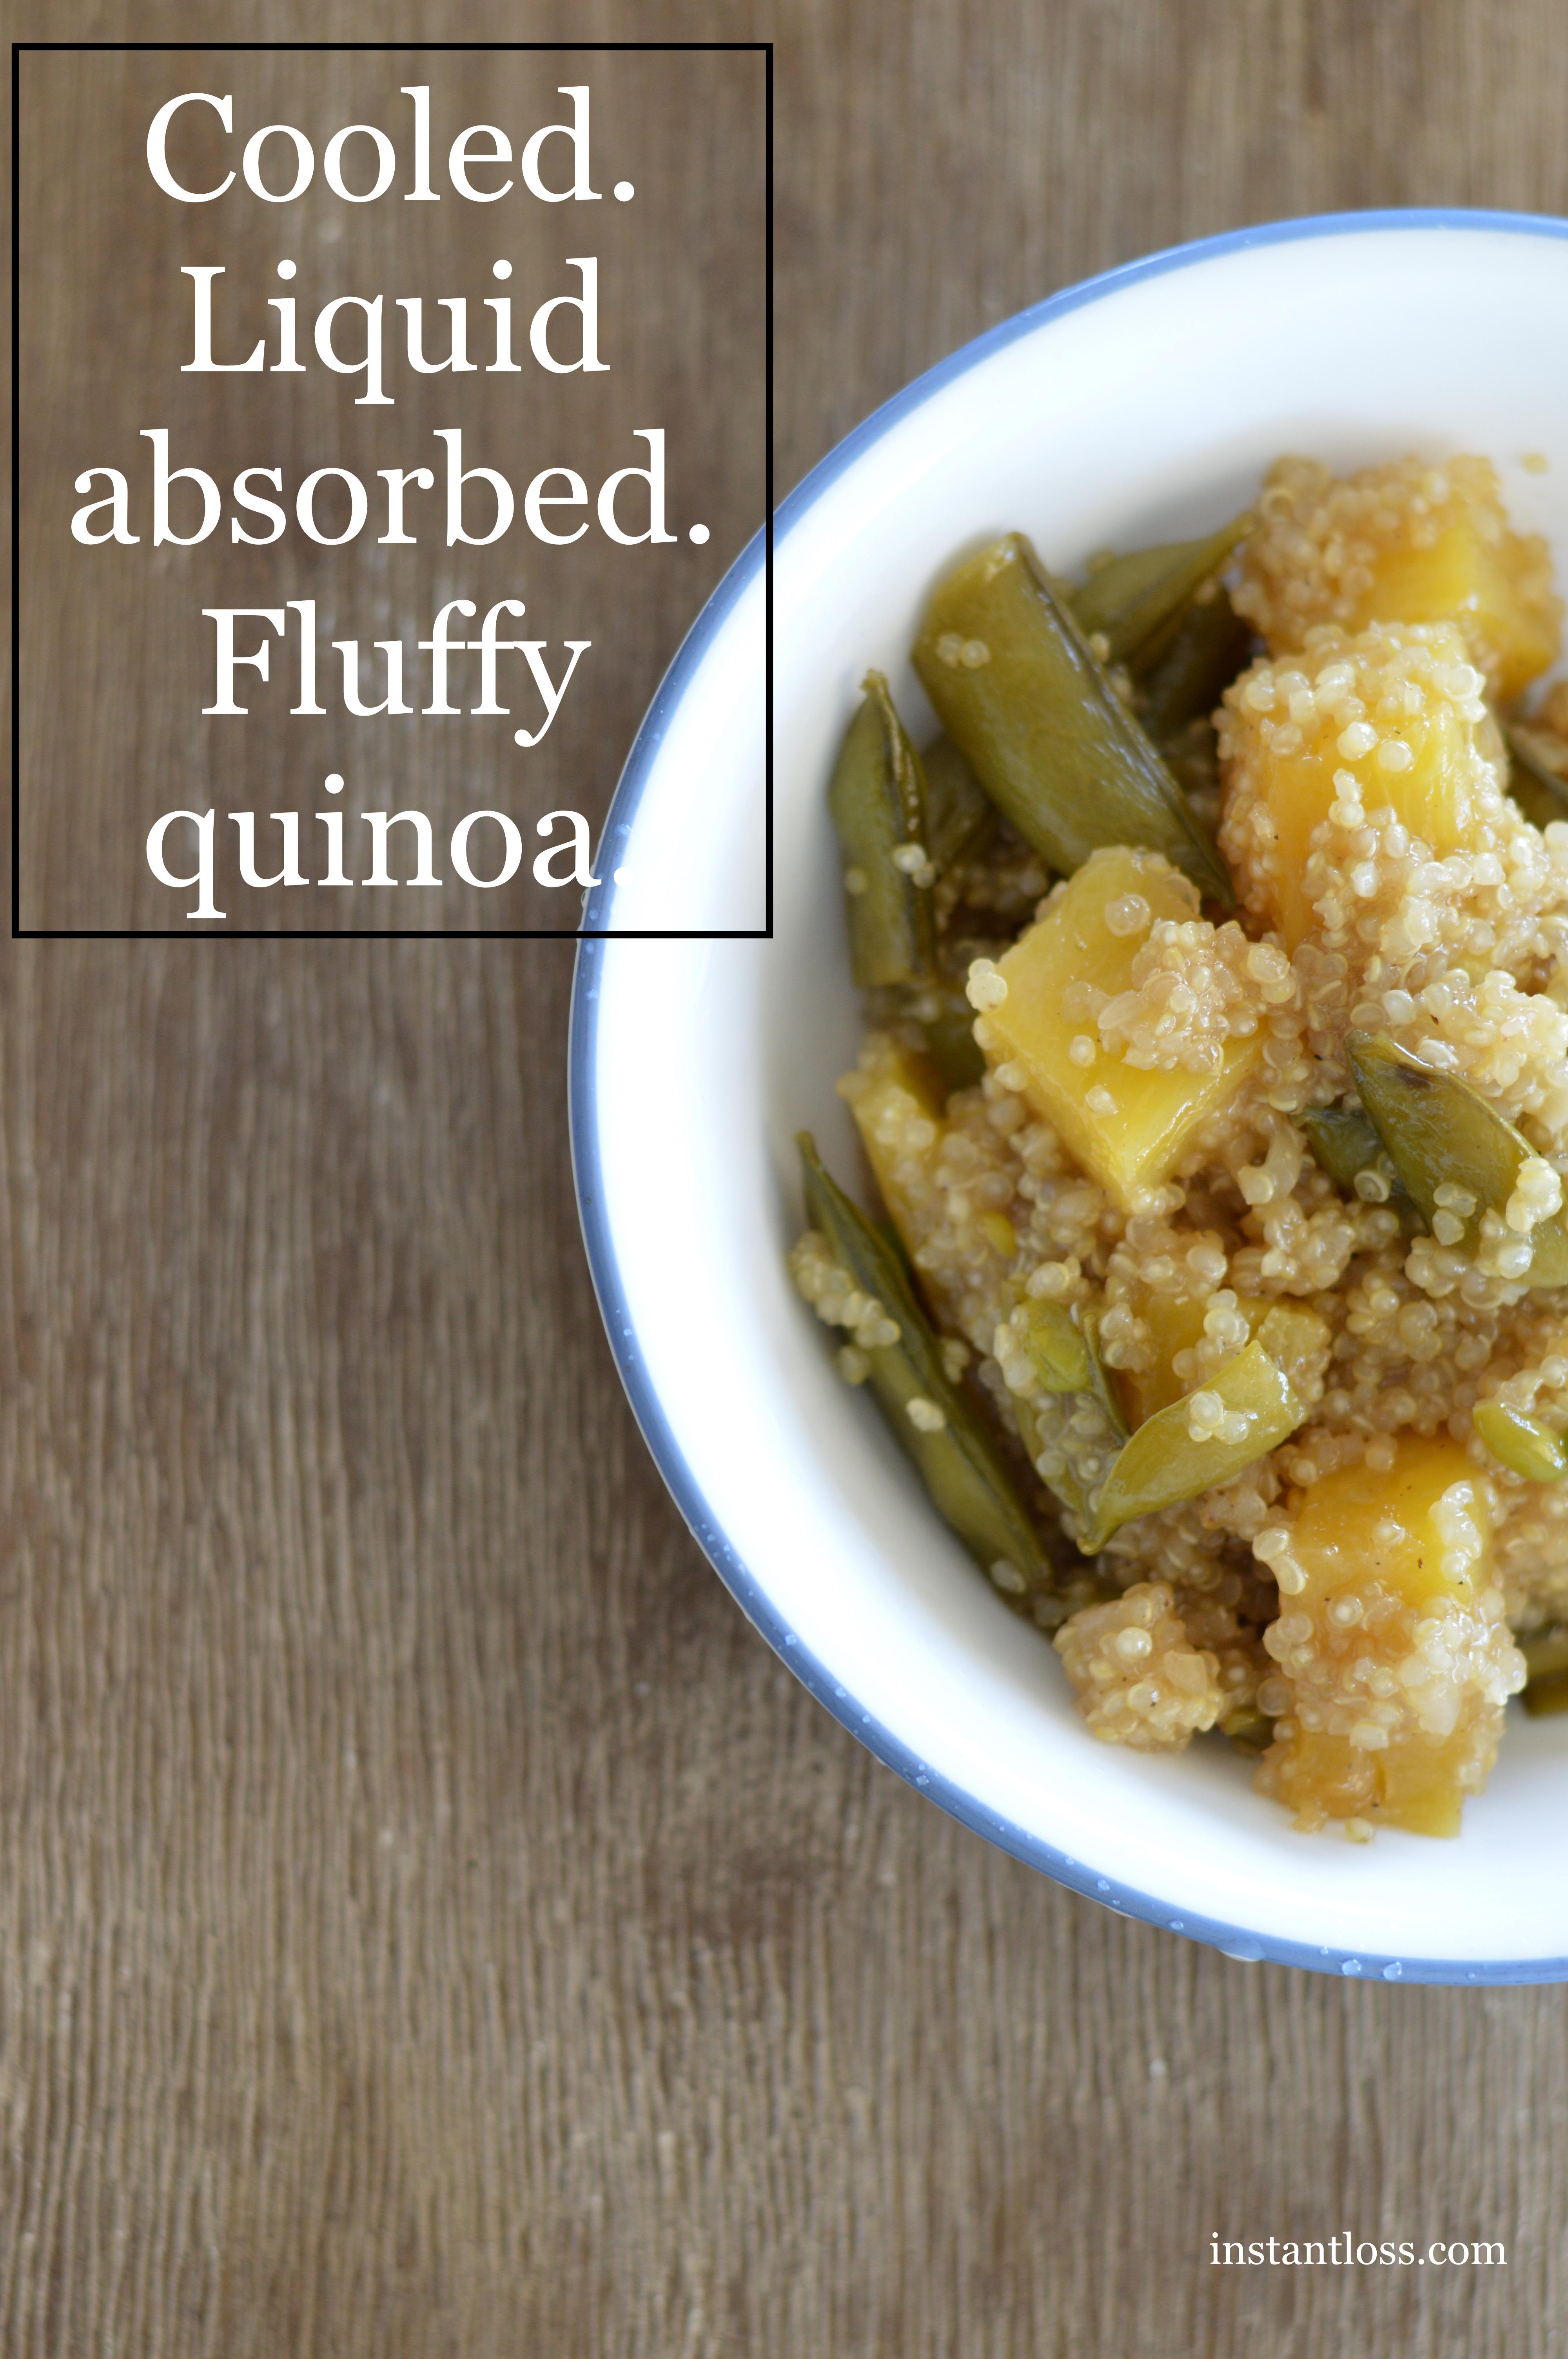 Instant Pot Pineapple Teriyaki Quinoa instantloss.com